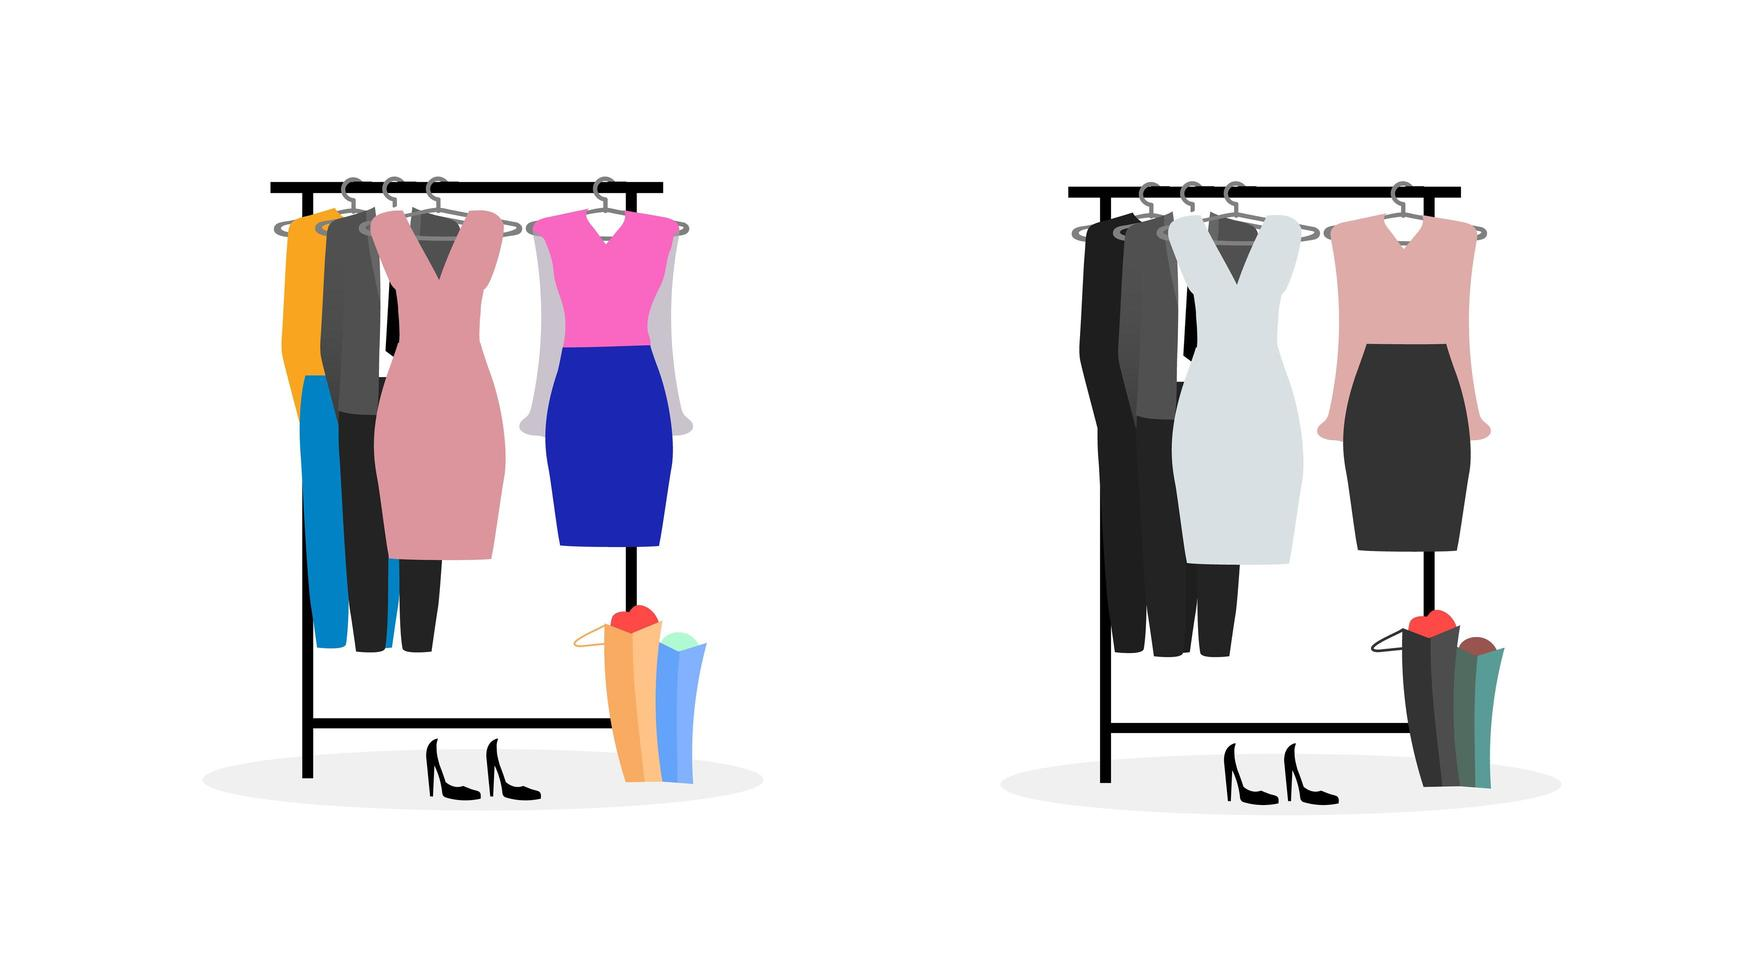 kledingrekken platte objecten instellen vector